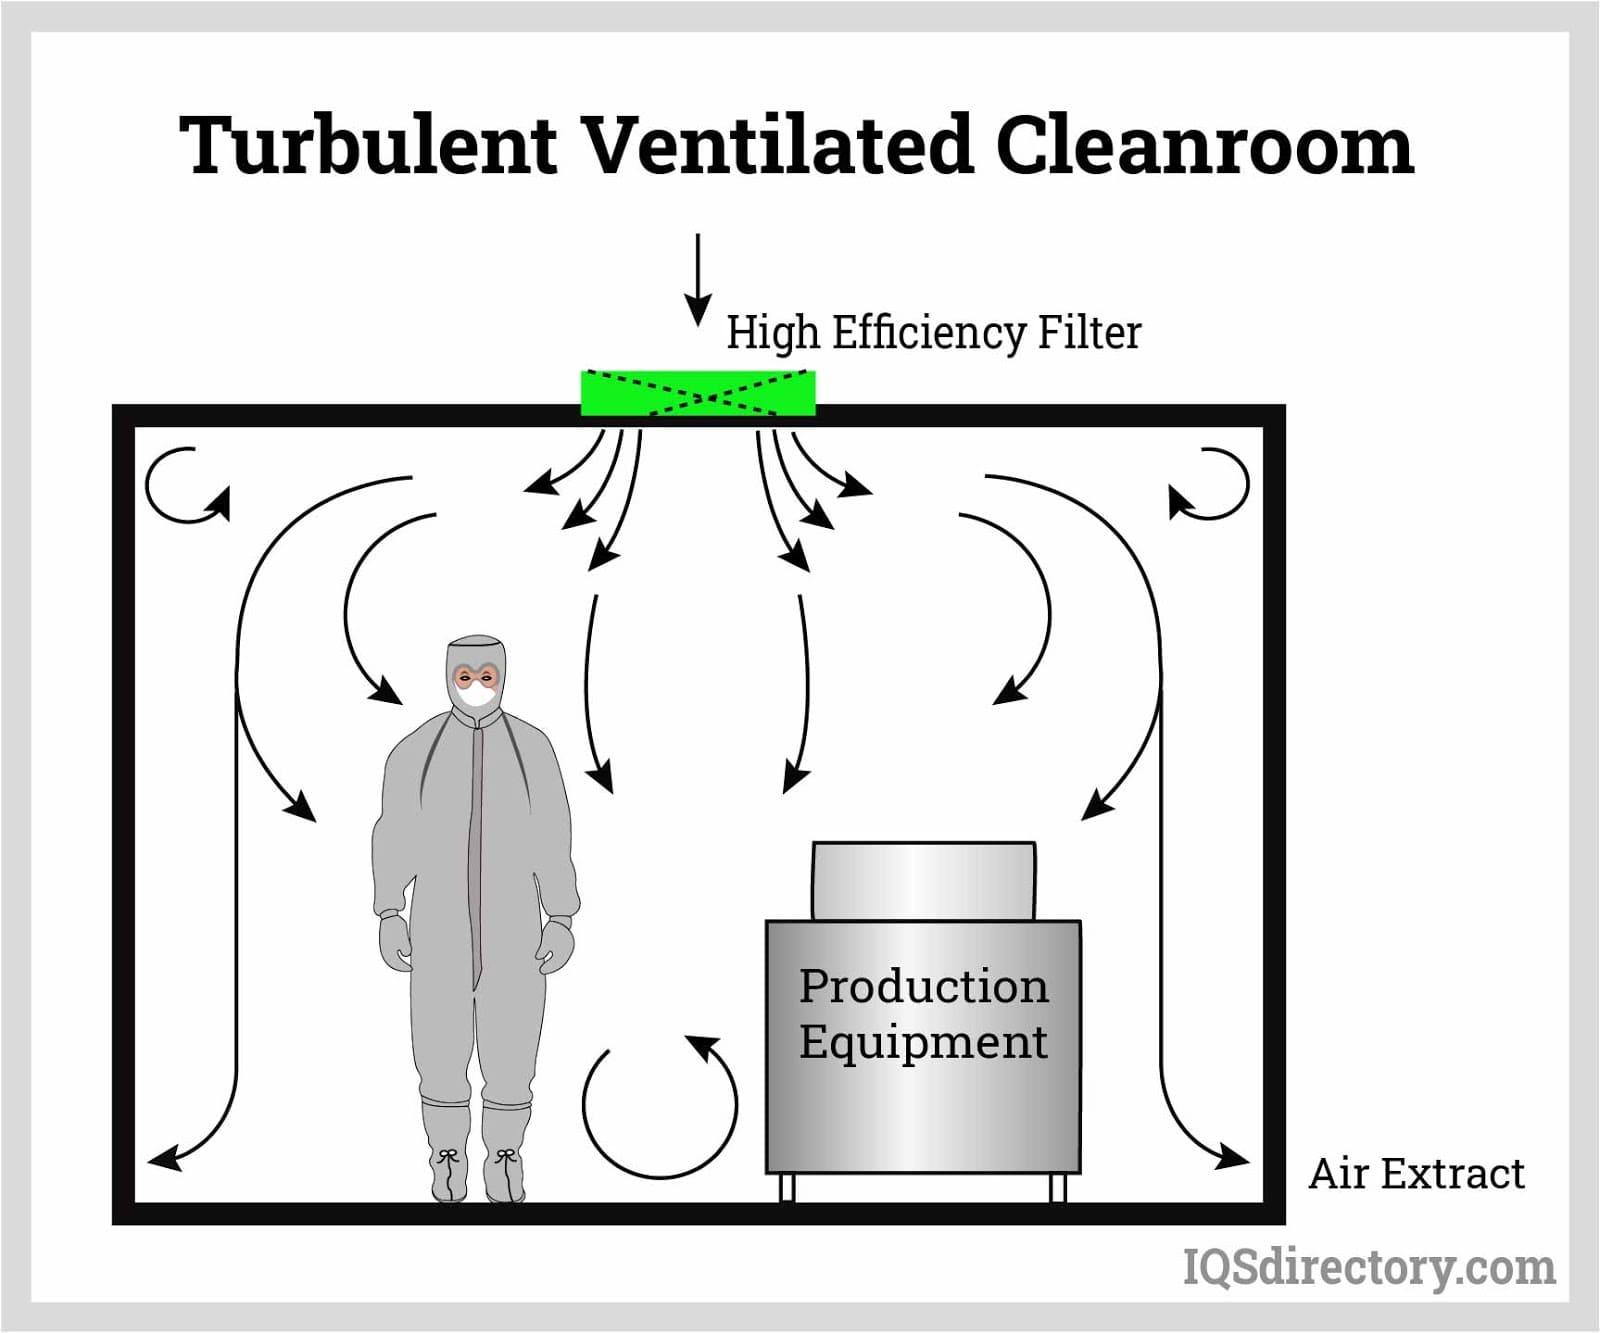 Turbulent Ventilated Cleanroom